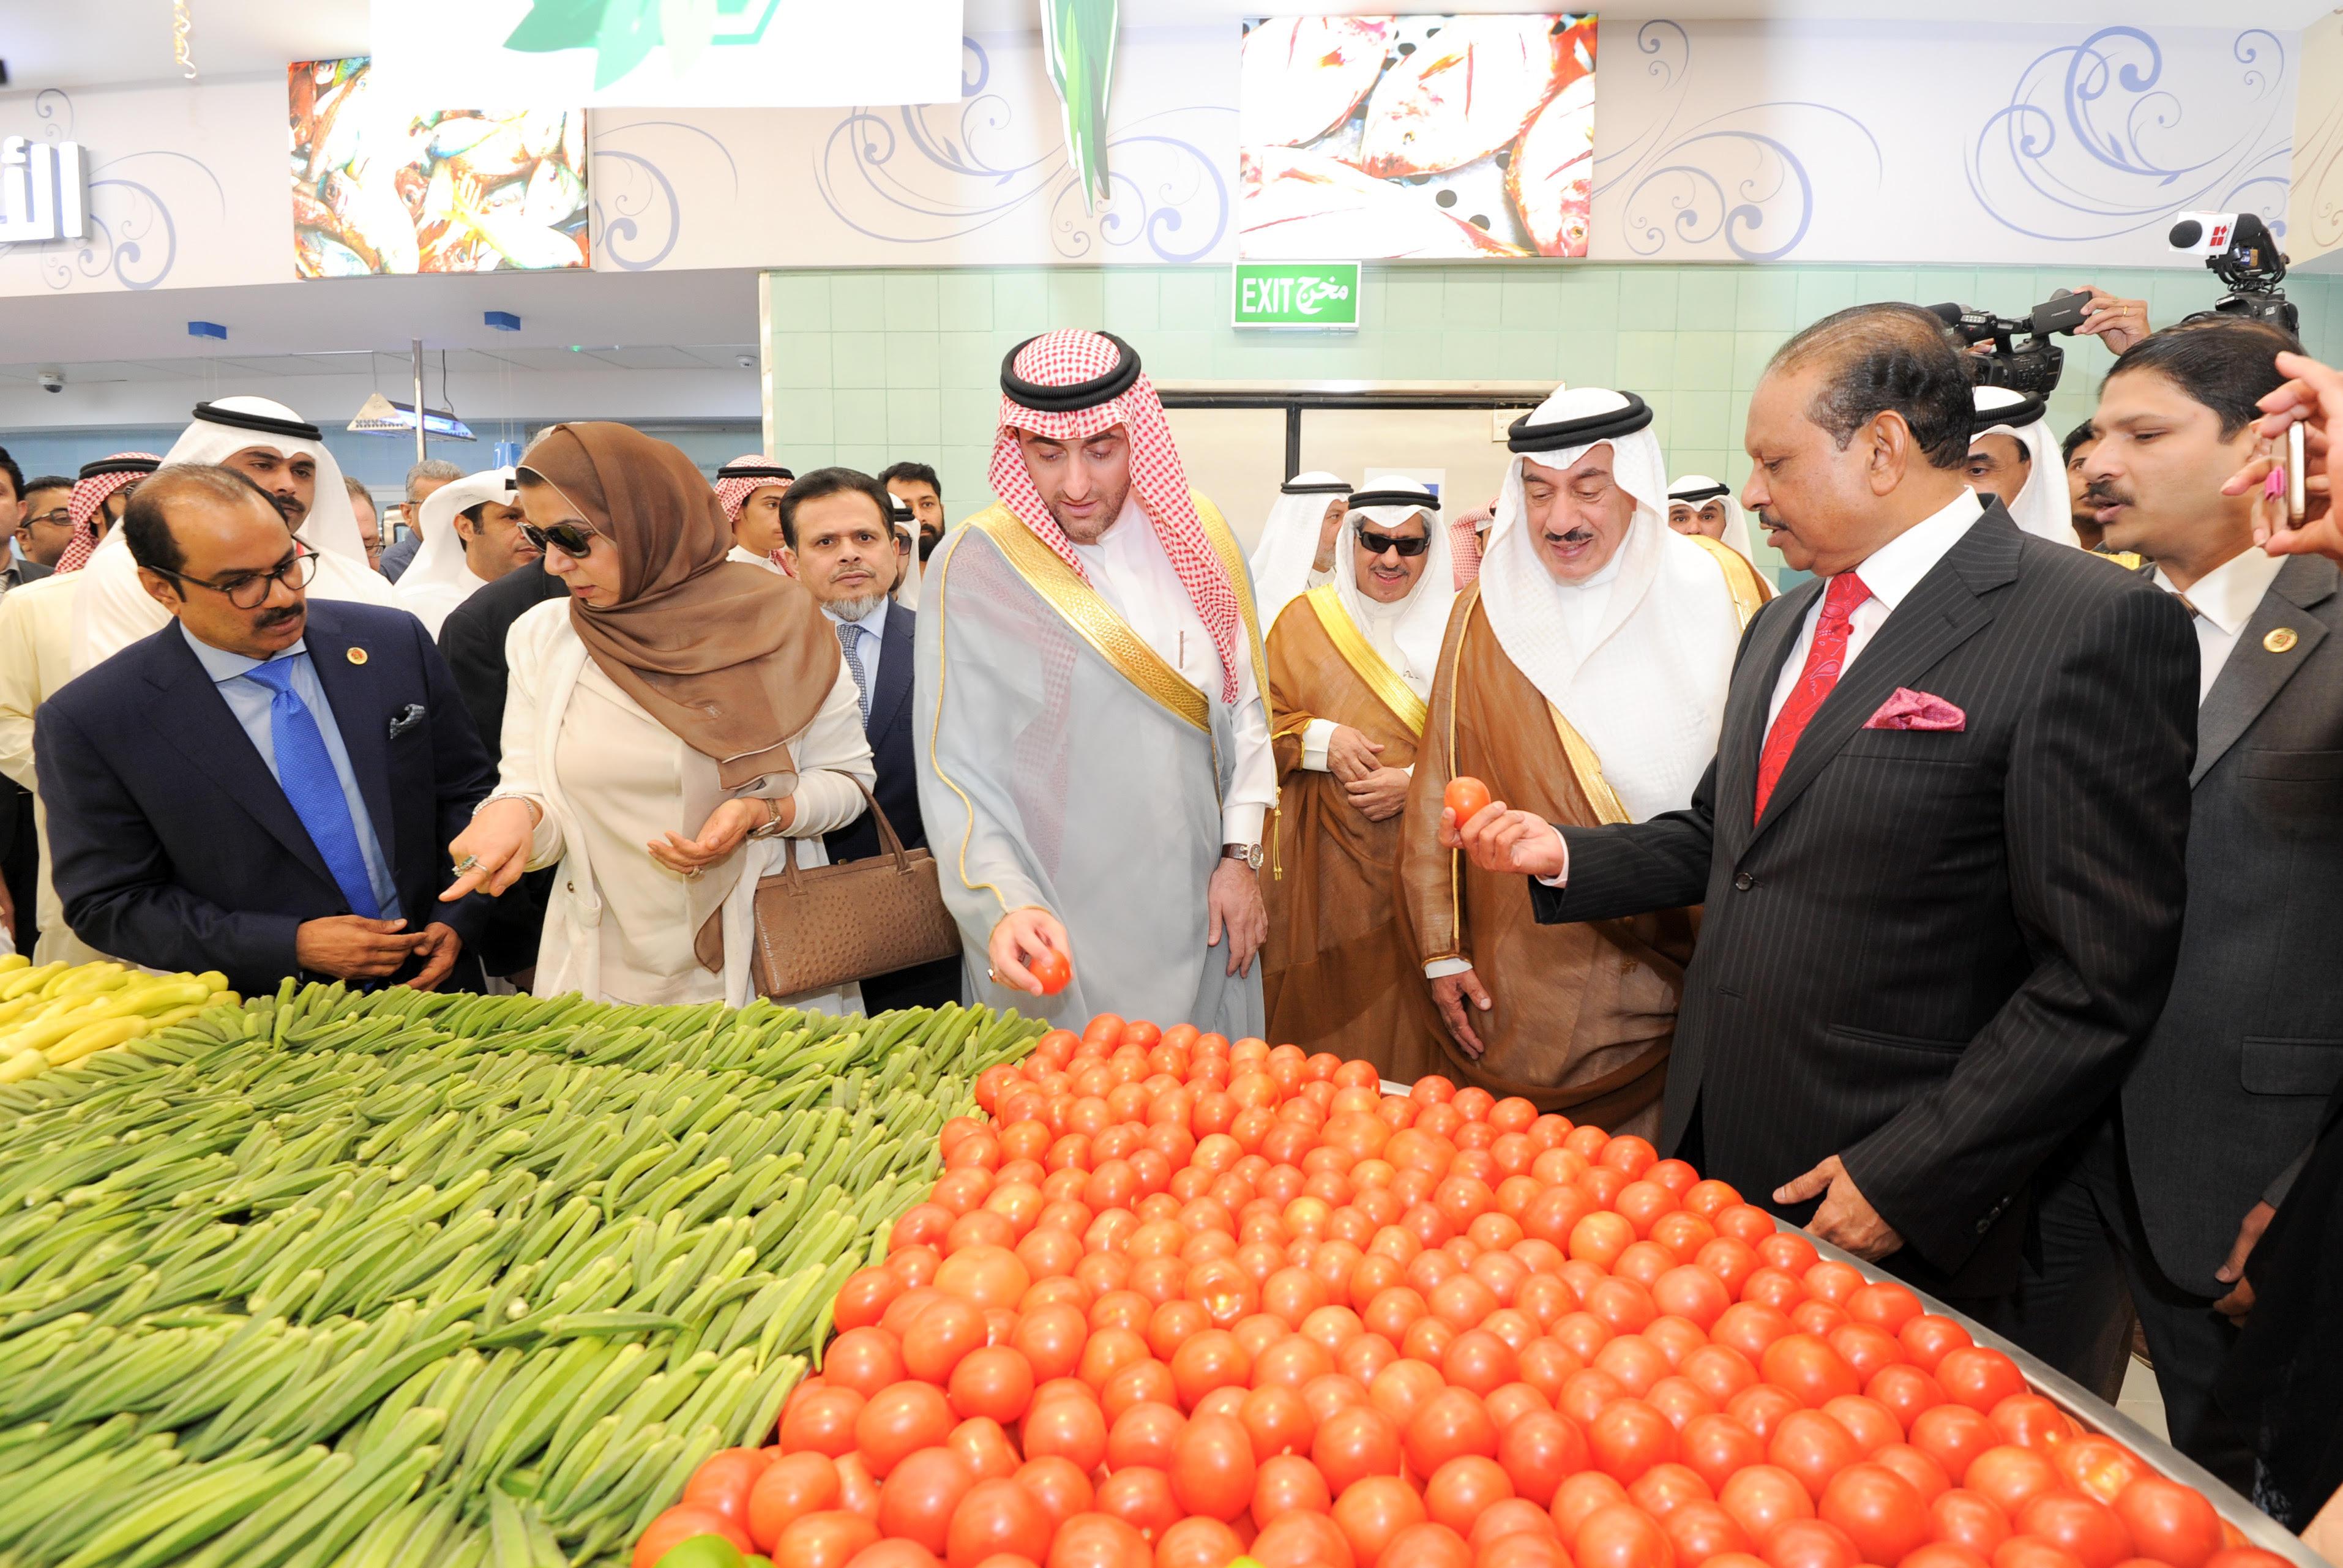 LULU EXPANDS KUWAIT OPERATIONS OPENS 7th hypermarket in Al Jahra